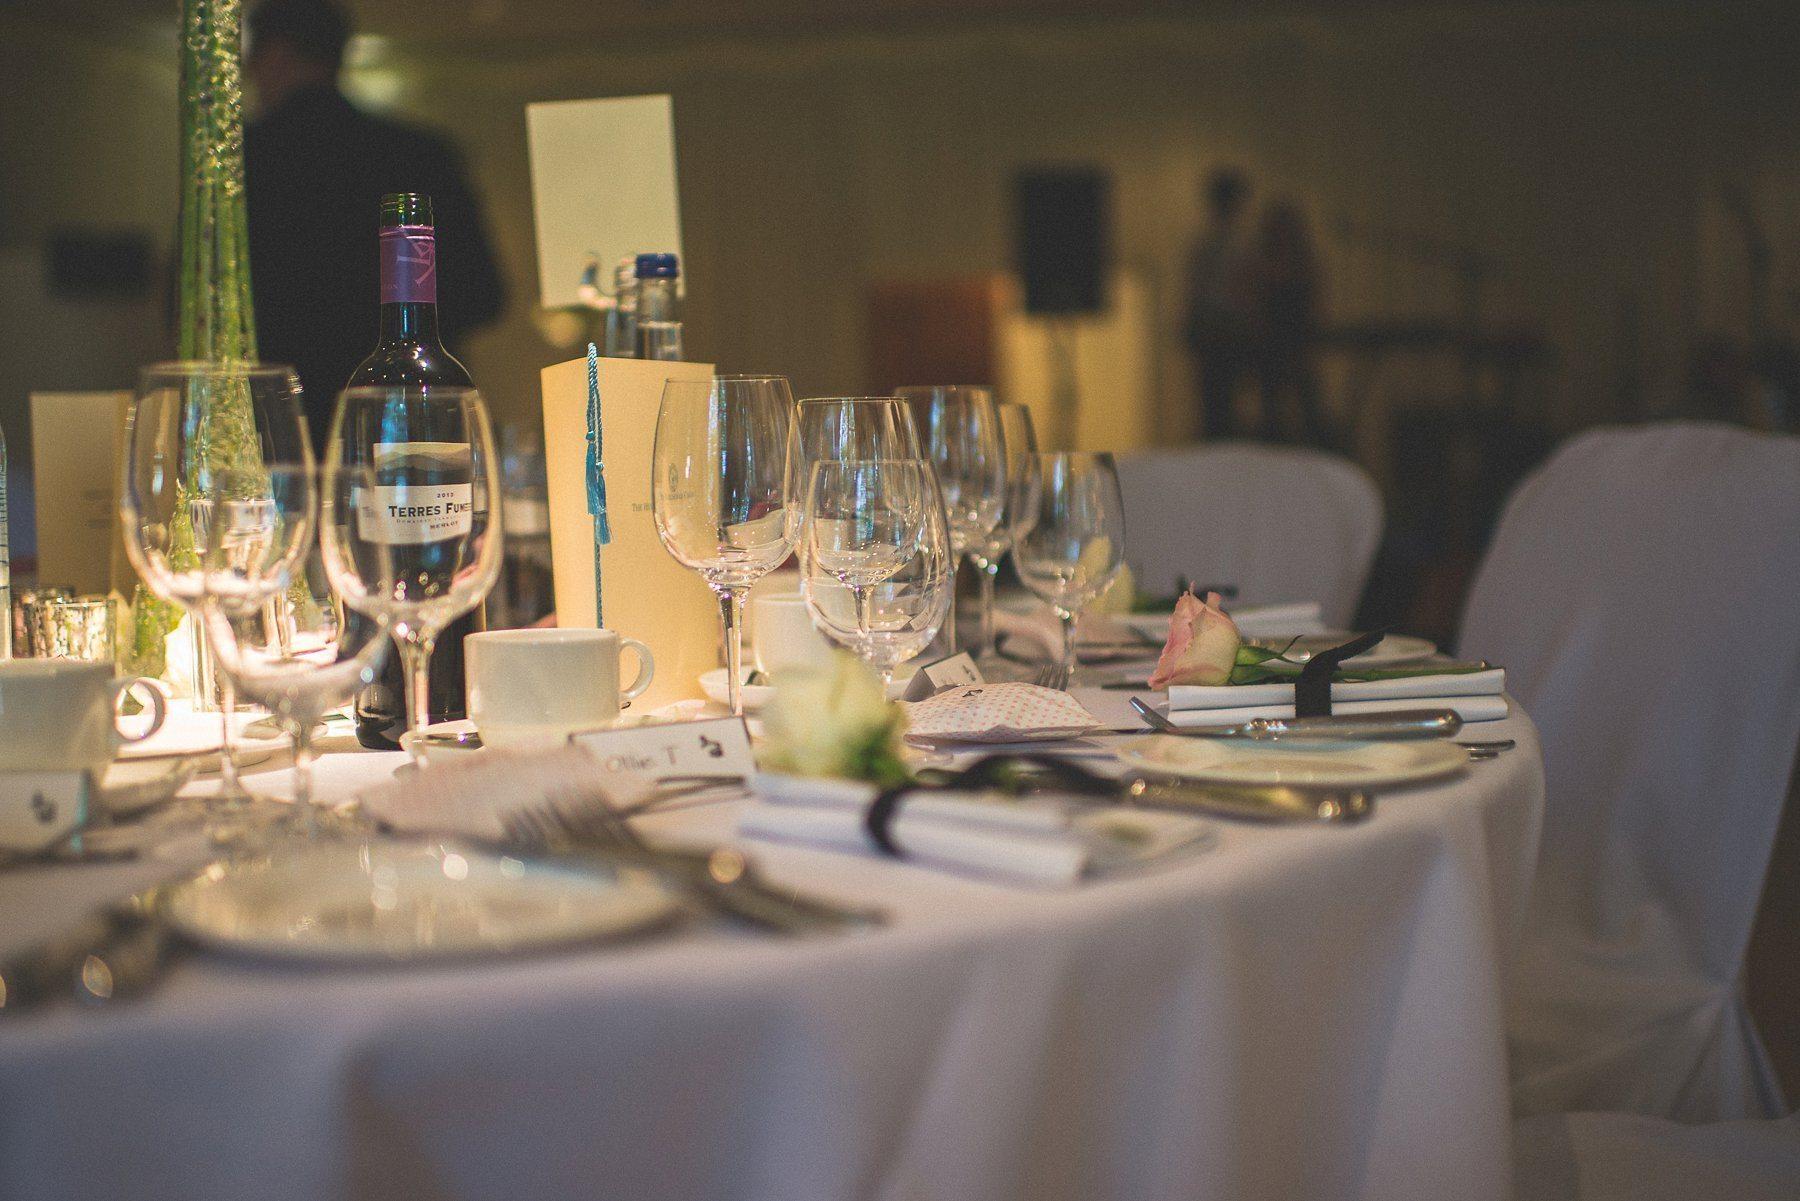 The Hurlingham Club wedding breakfast table settings